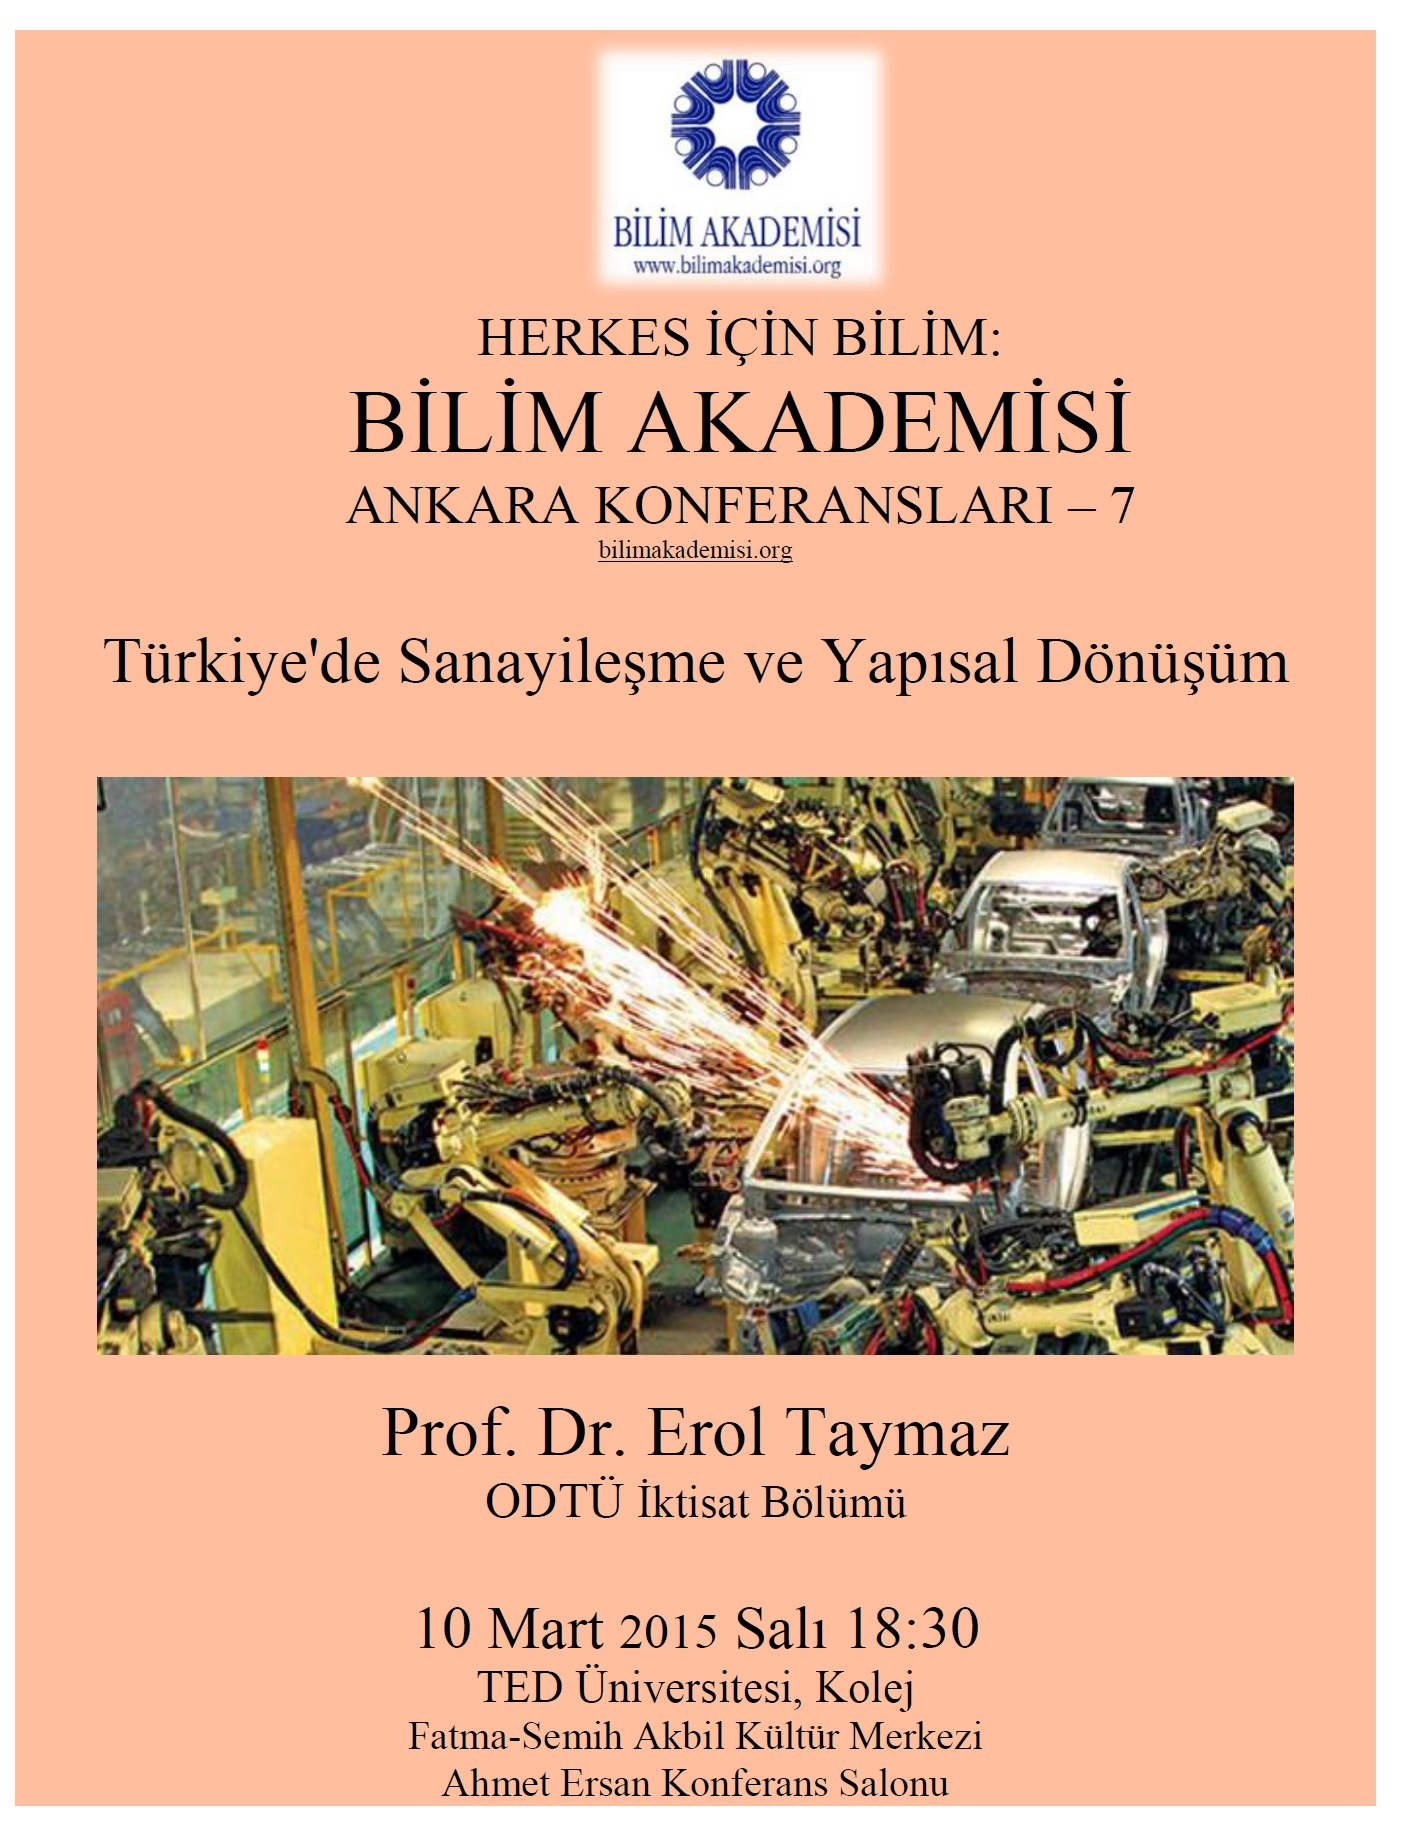 Industrialization and Structural Change in Turkey – Speaker: Erol Taymaz